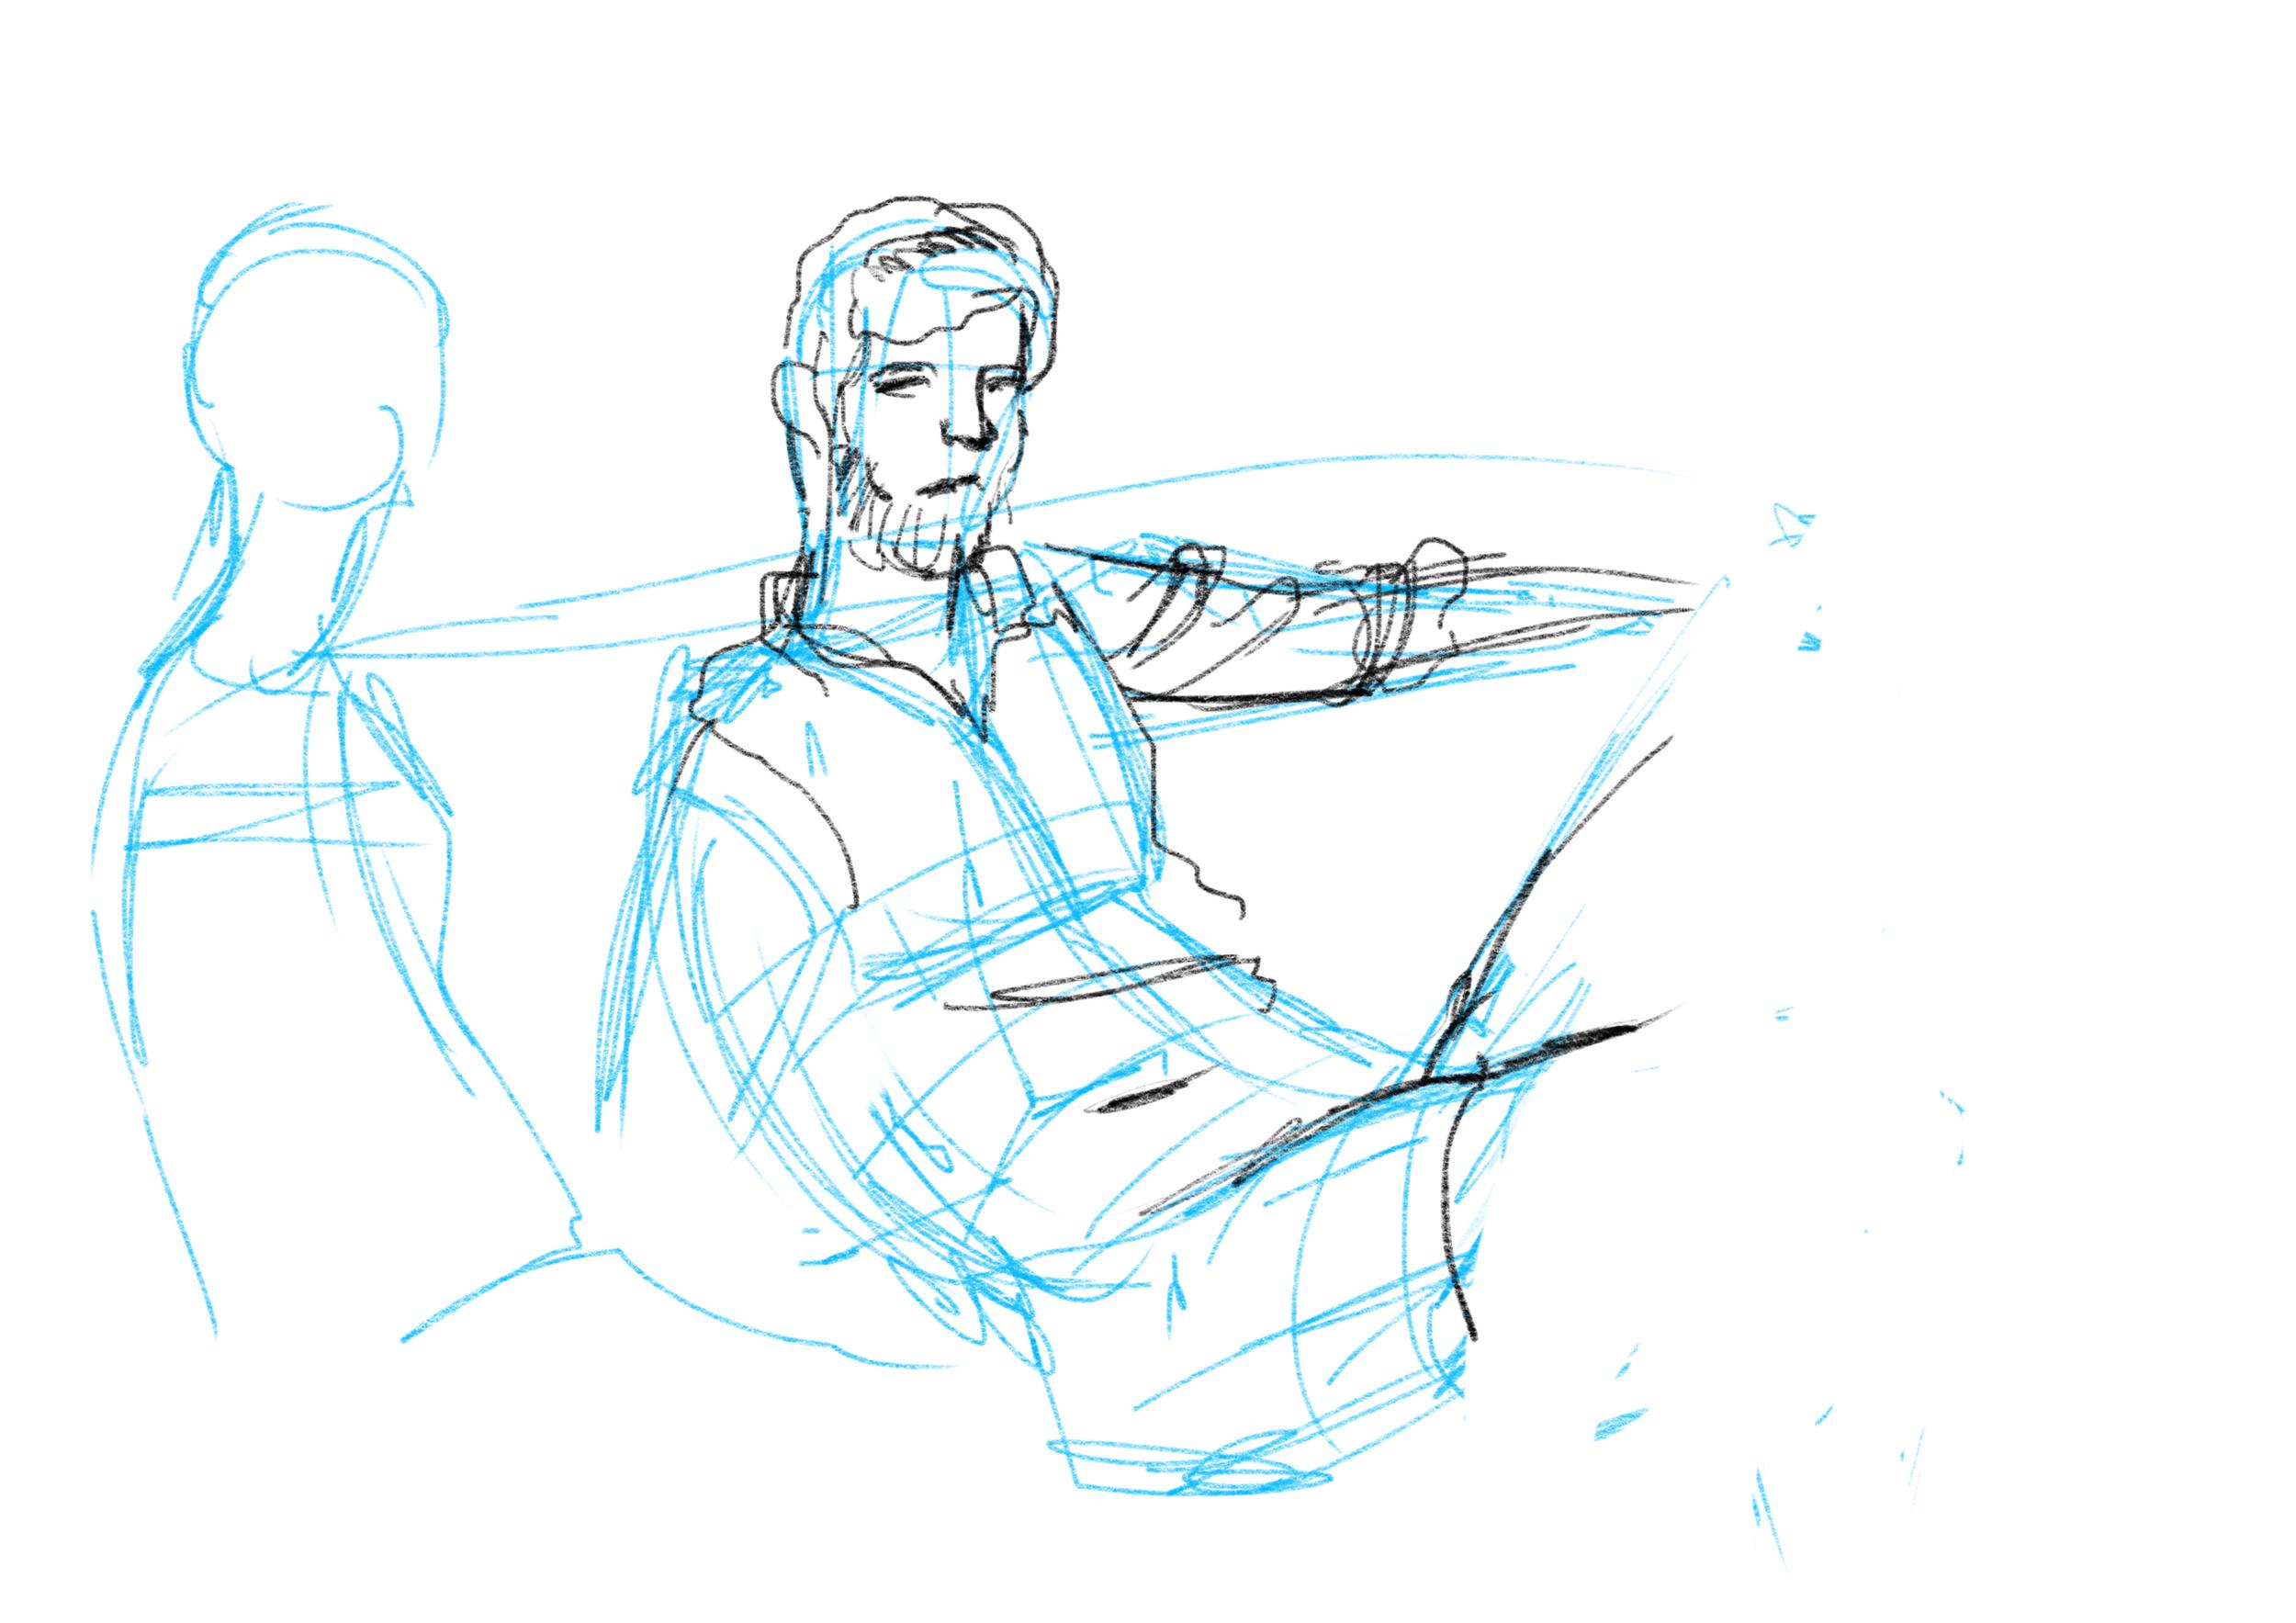 13 - 07 - 23 - digital drawing - cartel 04.jpeg